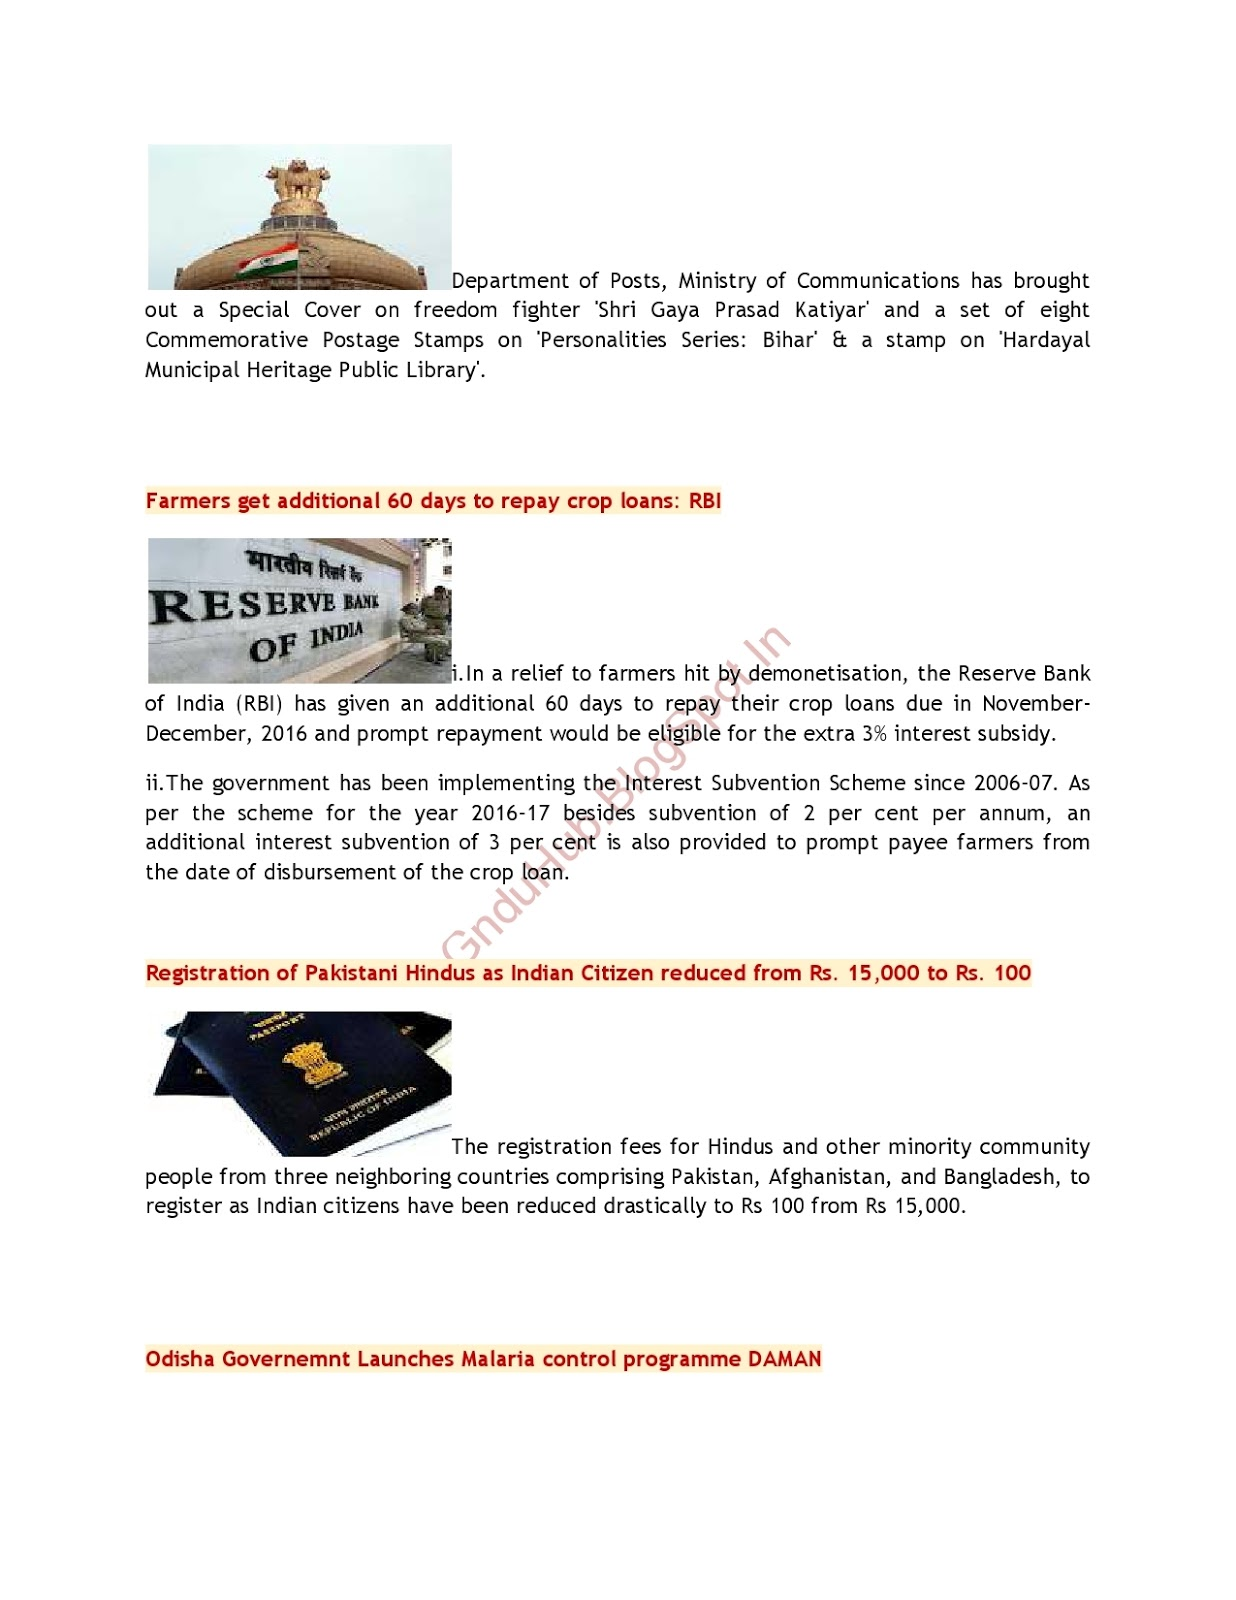 Dissertation abstracts international xchange card